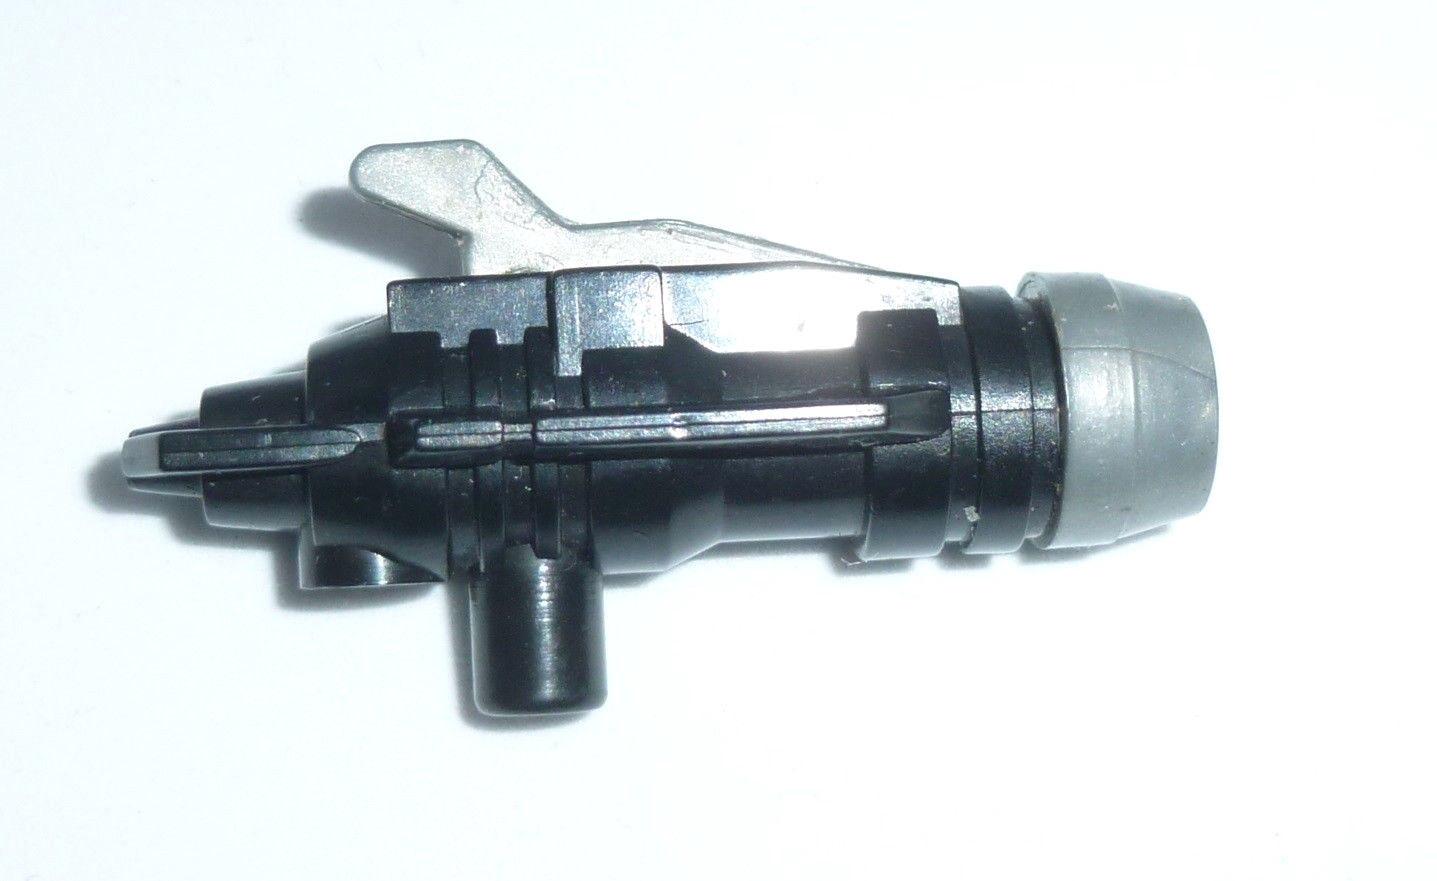 Dinobot Snarl Weapon Waffe Launcher Blaster